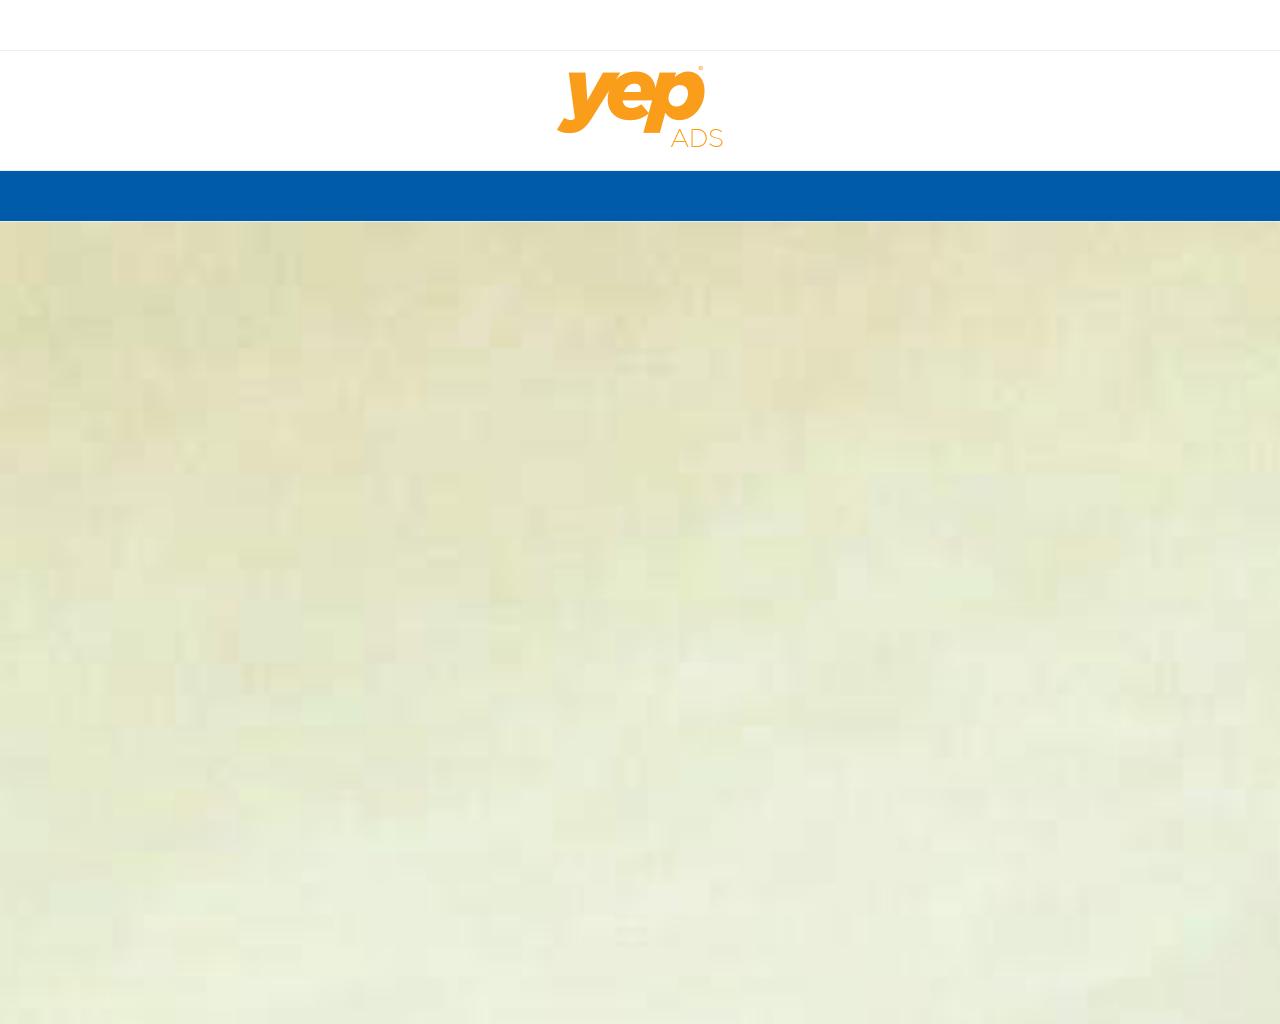 Yep-Ads-Advertising-Reviews-Pricing